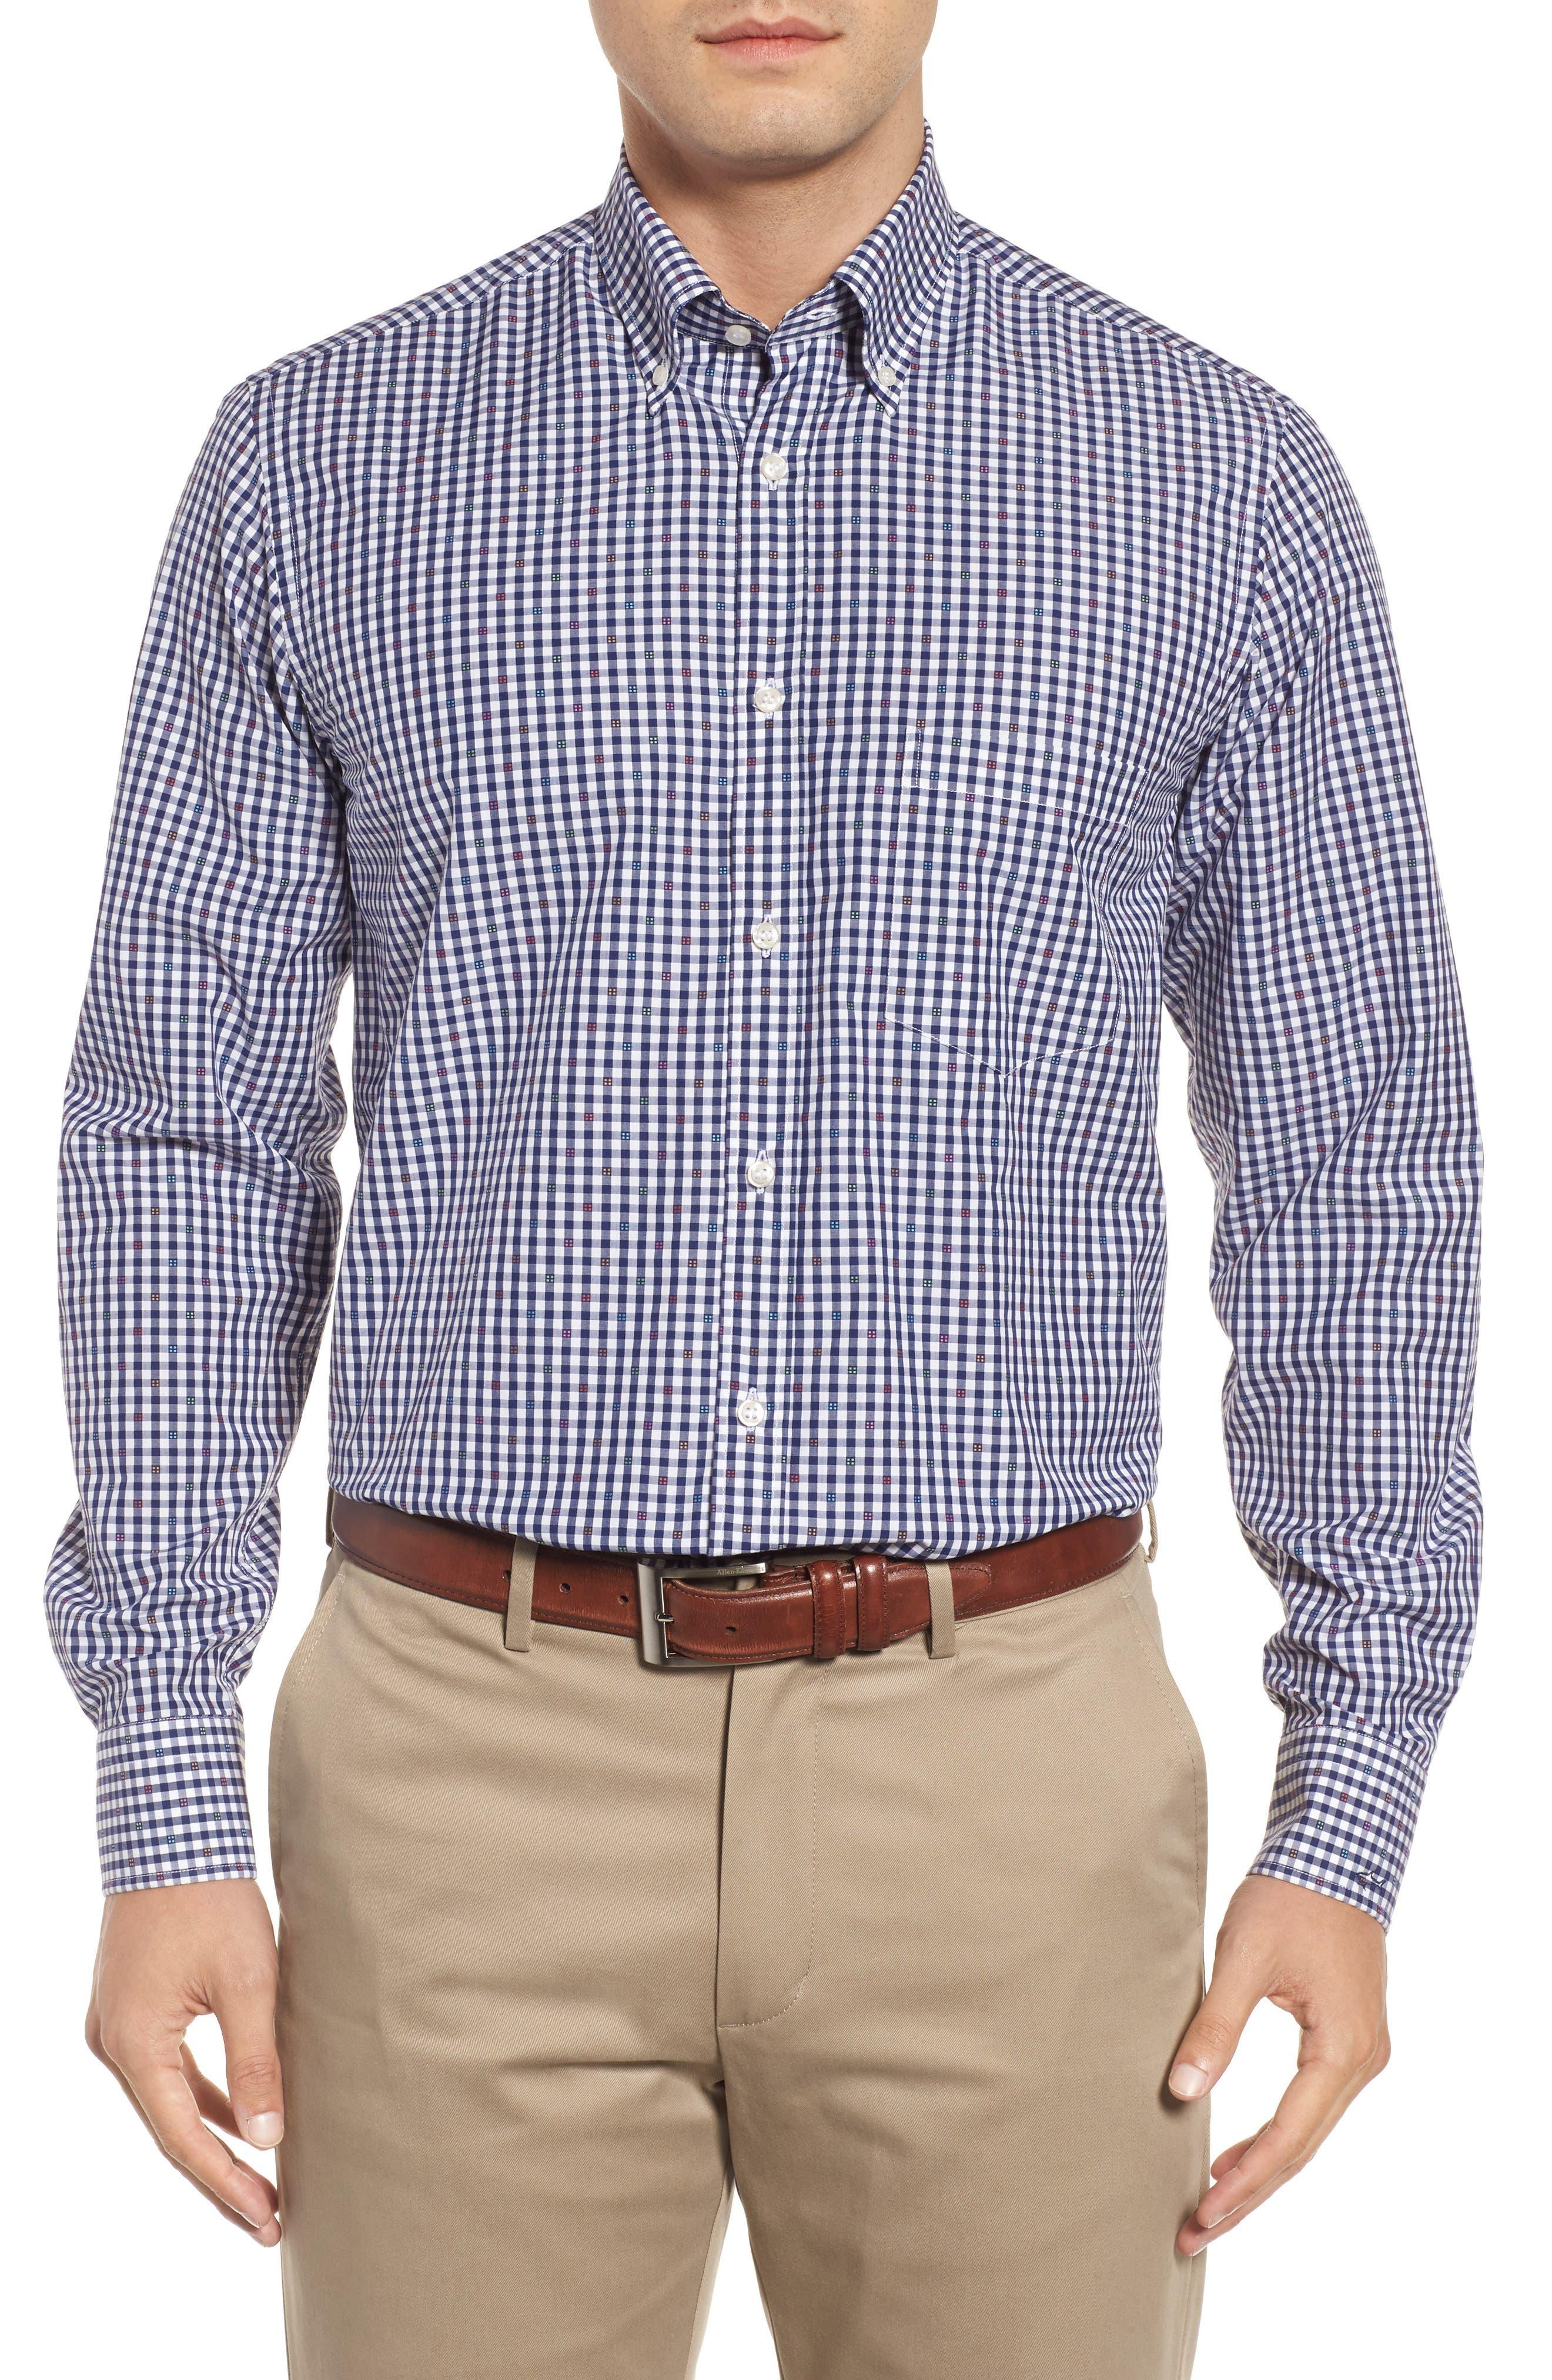 Paul&Shark Regular Fit Jacquard Check Sport Shirt,                         Main,                         color, Navy/ White